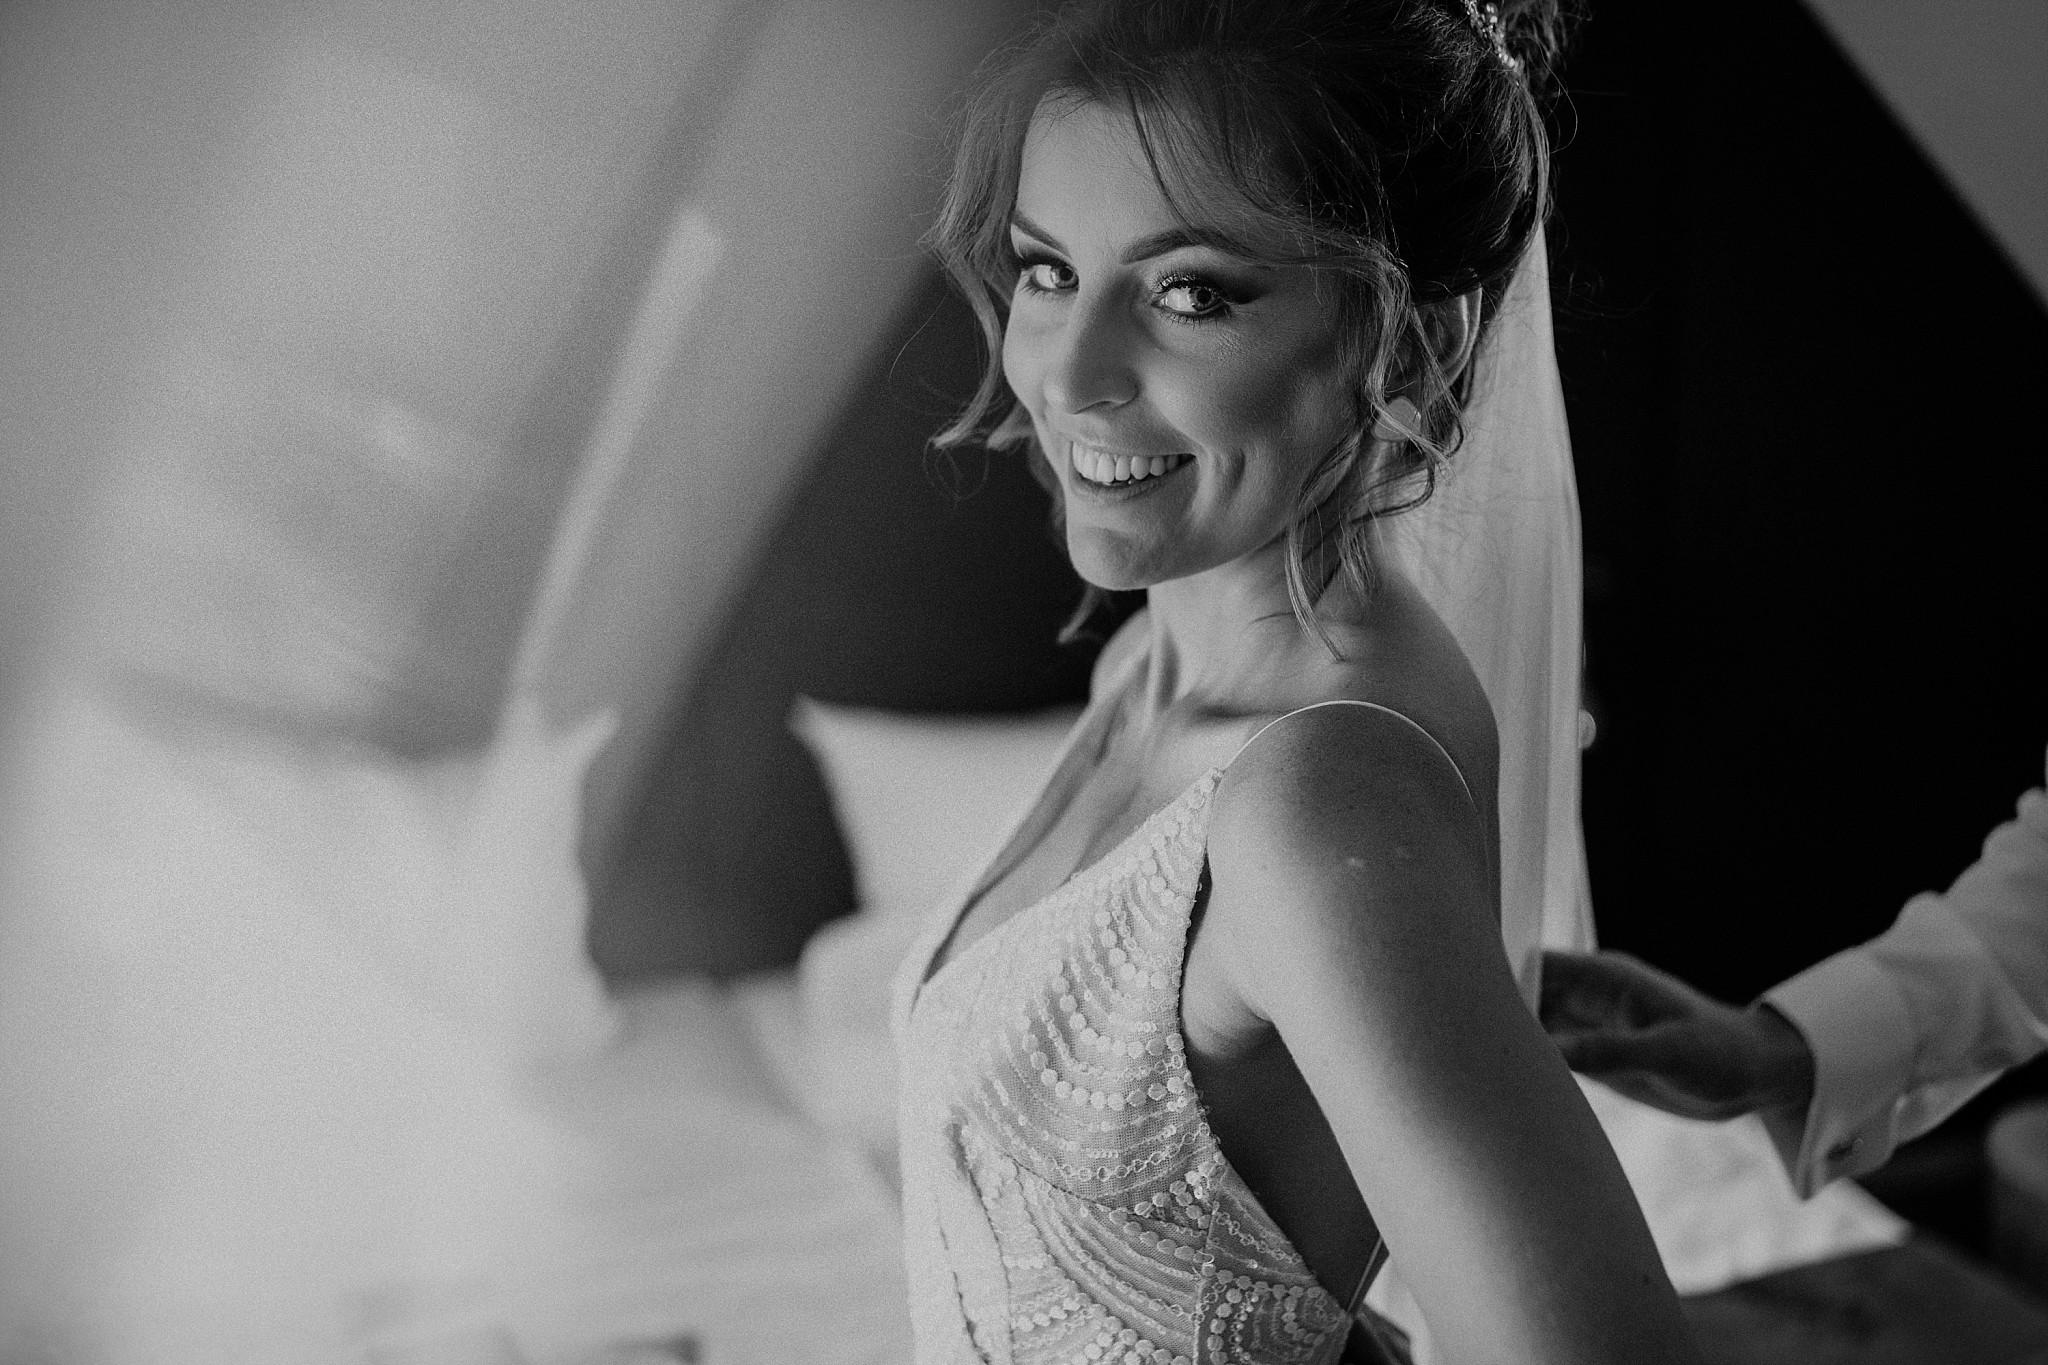 fotograf poznan wesele dobra truskawka piekne wesele pod poznaniem wesele w dobrej truskawce piekna para mloda slub marzen slub koronawirus slub listopad wesele koronawirus 075